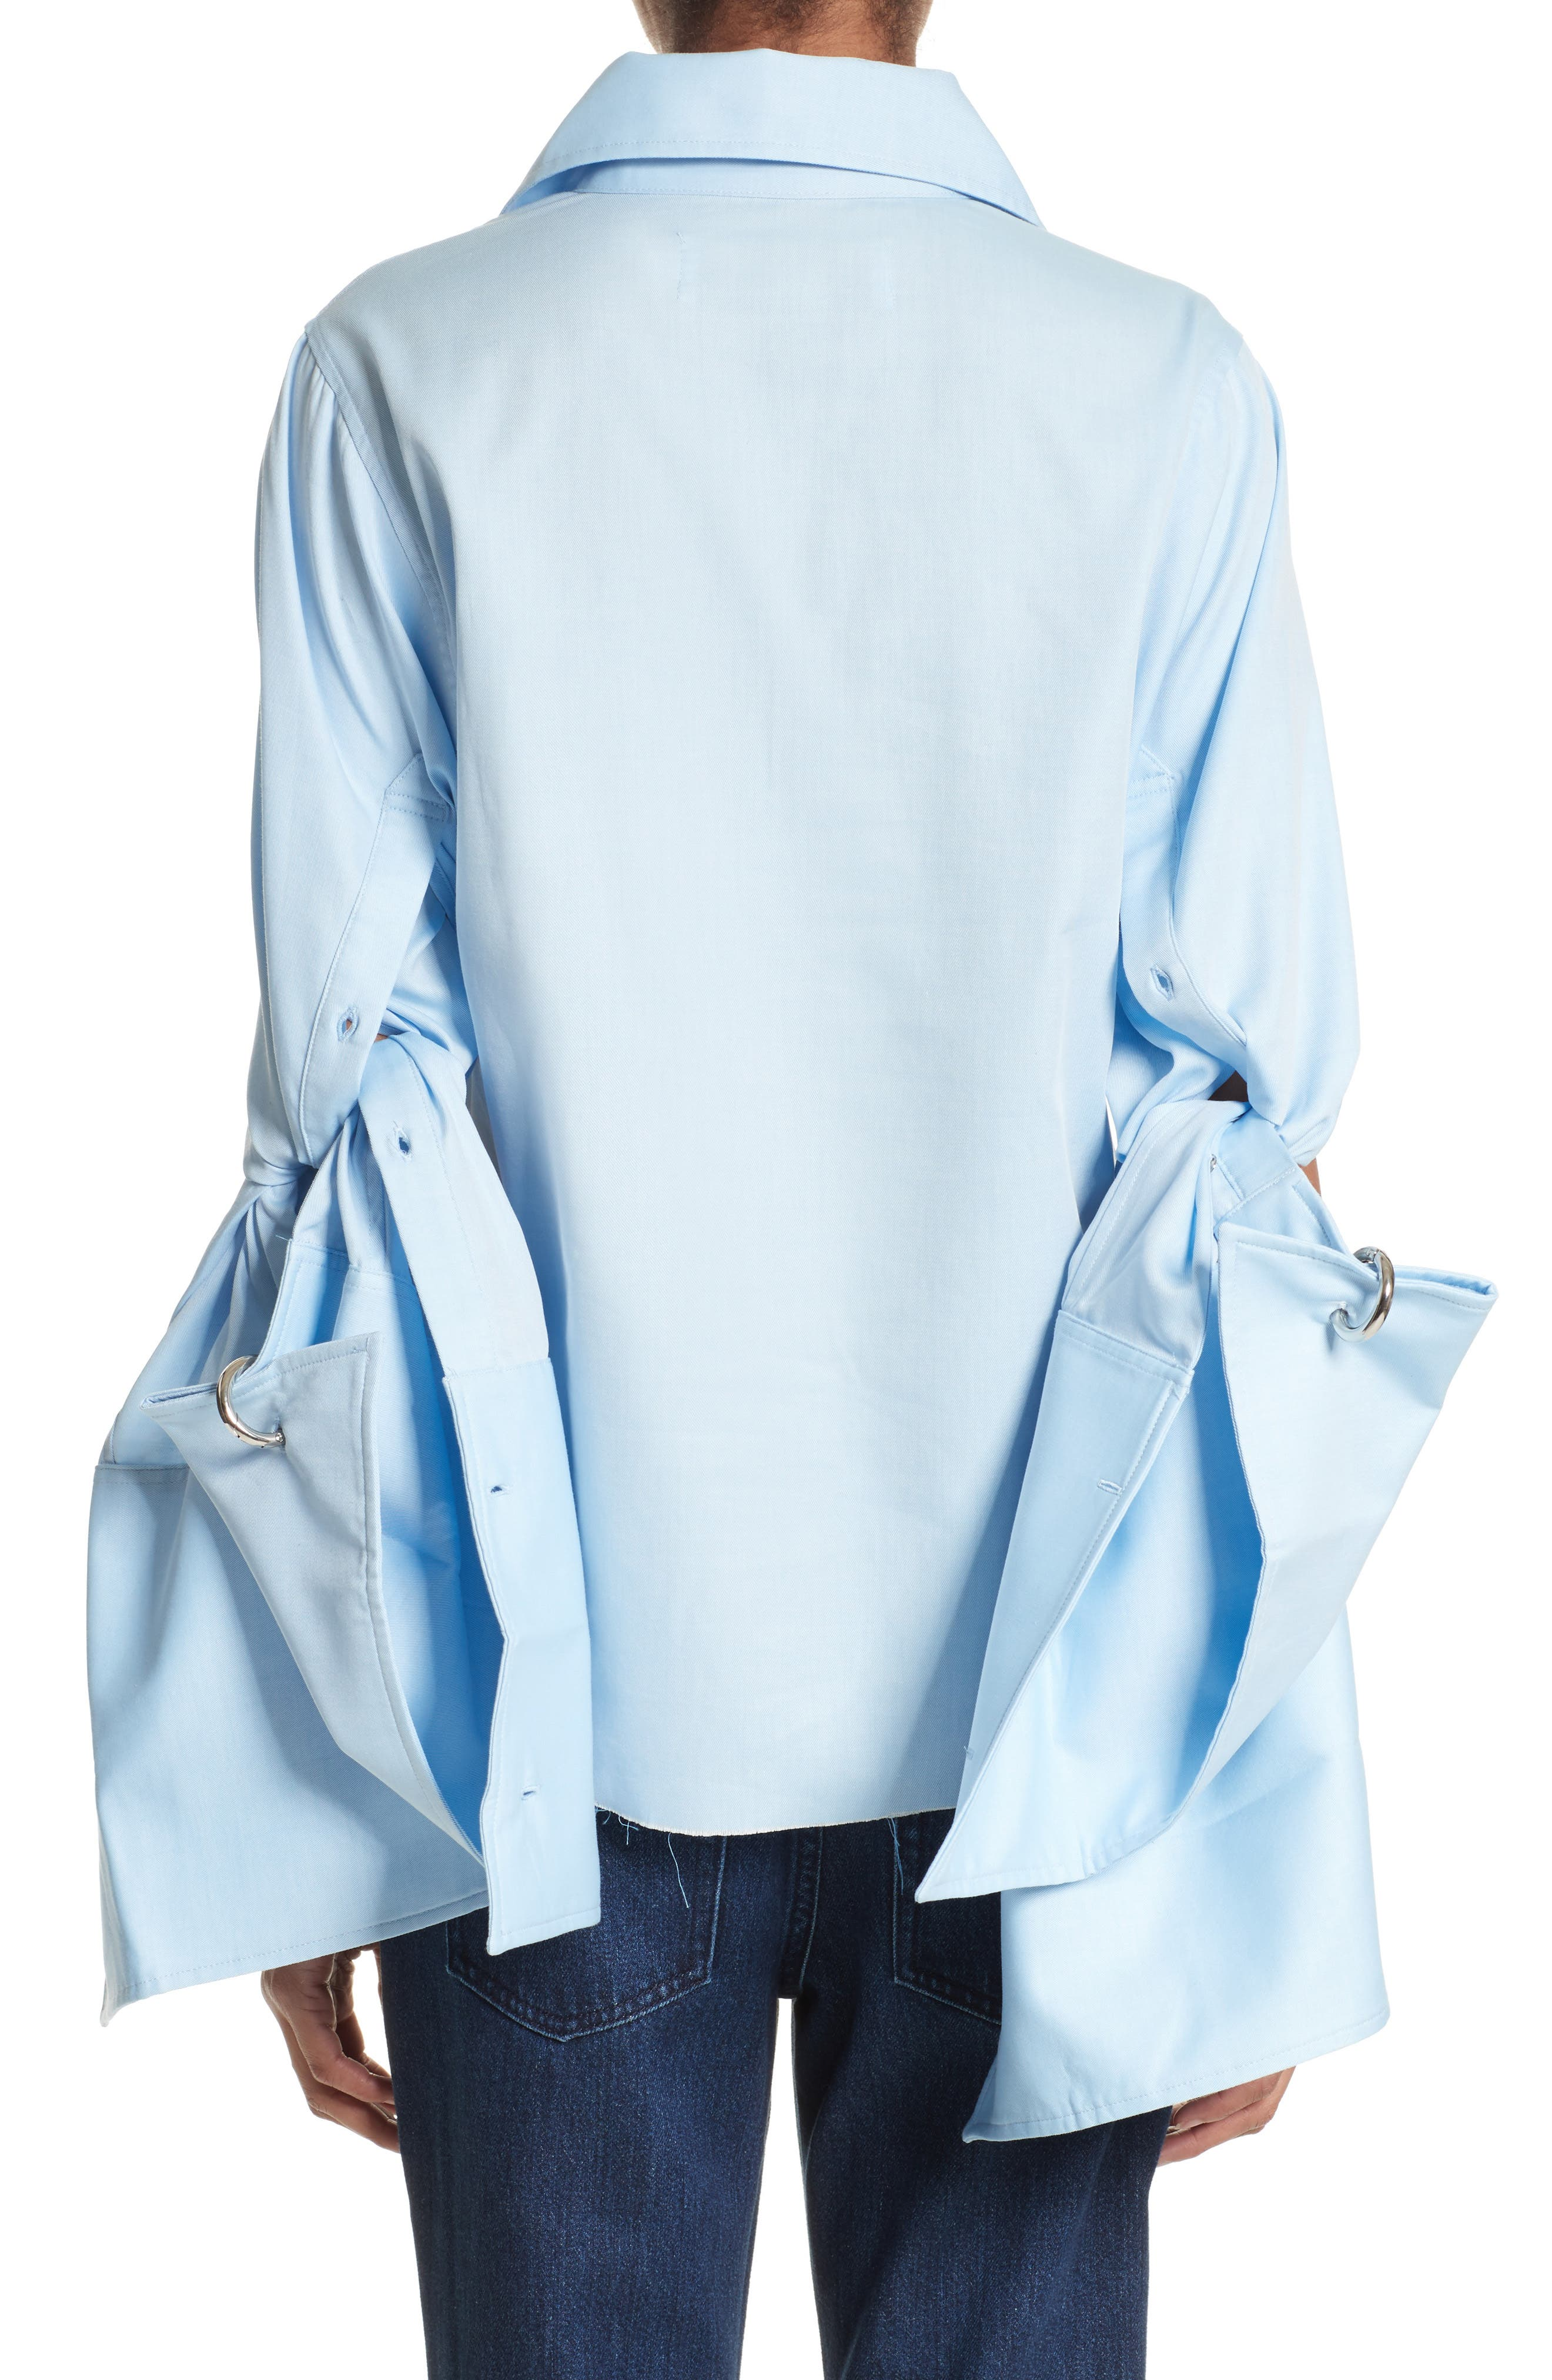 Marques'Almeida Double Sleeve Blouse,                             Alternate thumbnail 2, color,                             Light Blue